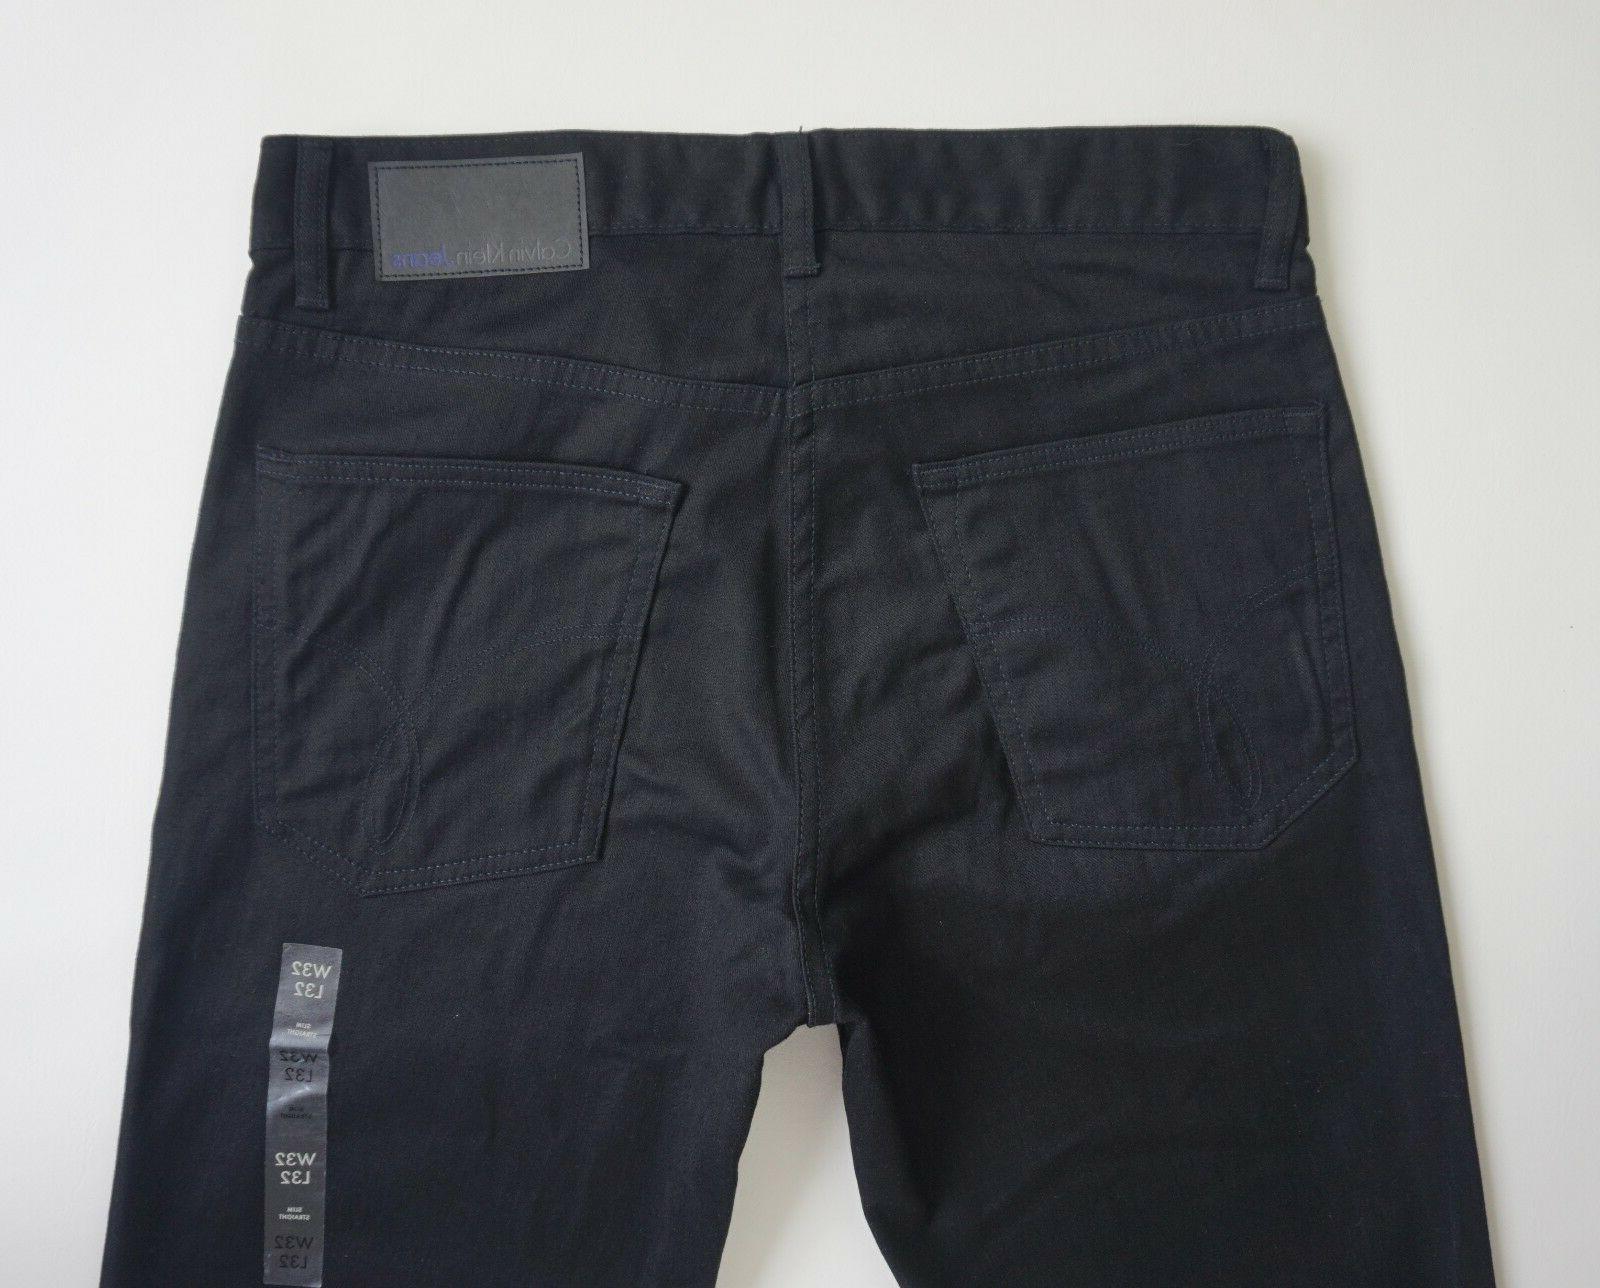 CALVIN SLIM LEG Jeans Men's, Authentic BRAND